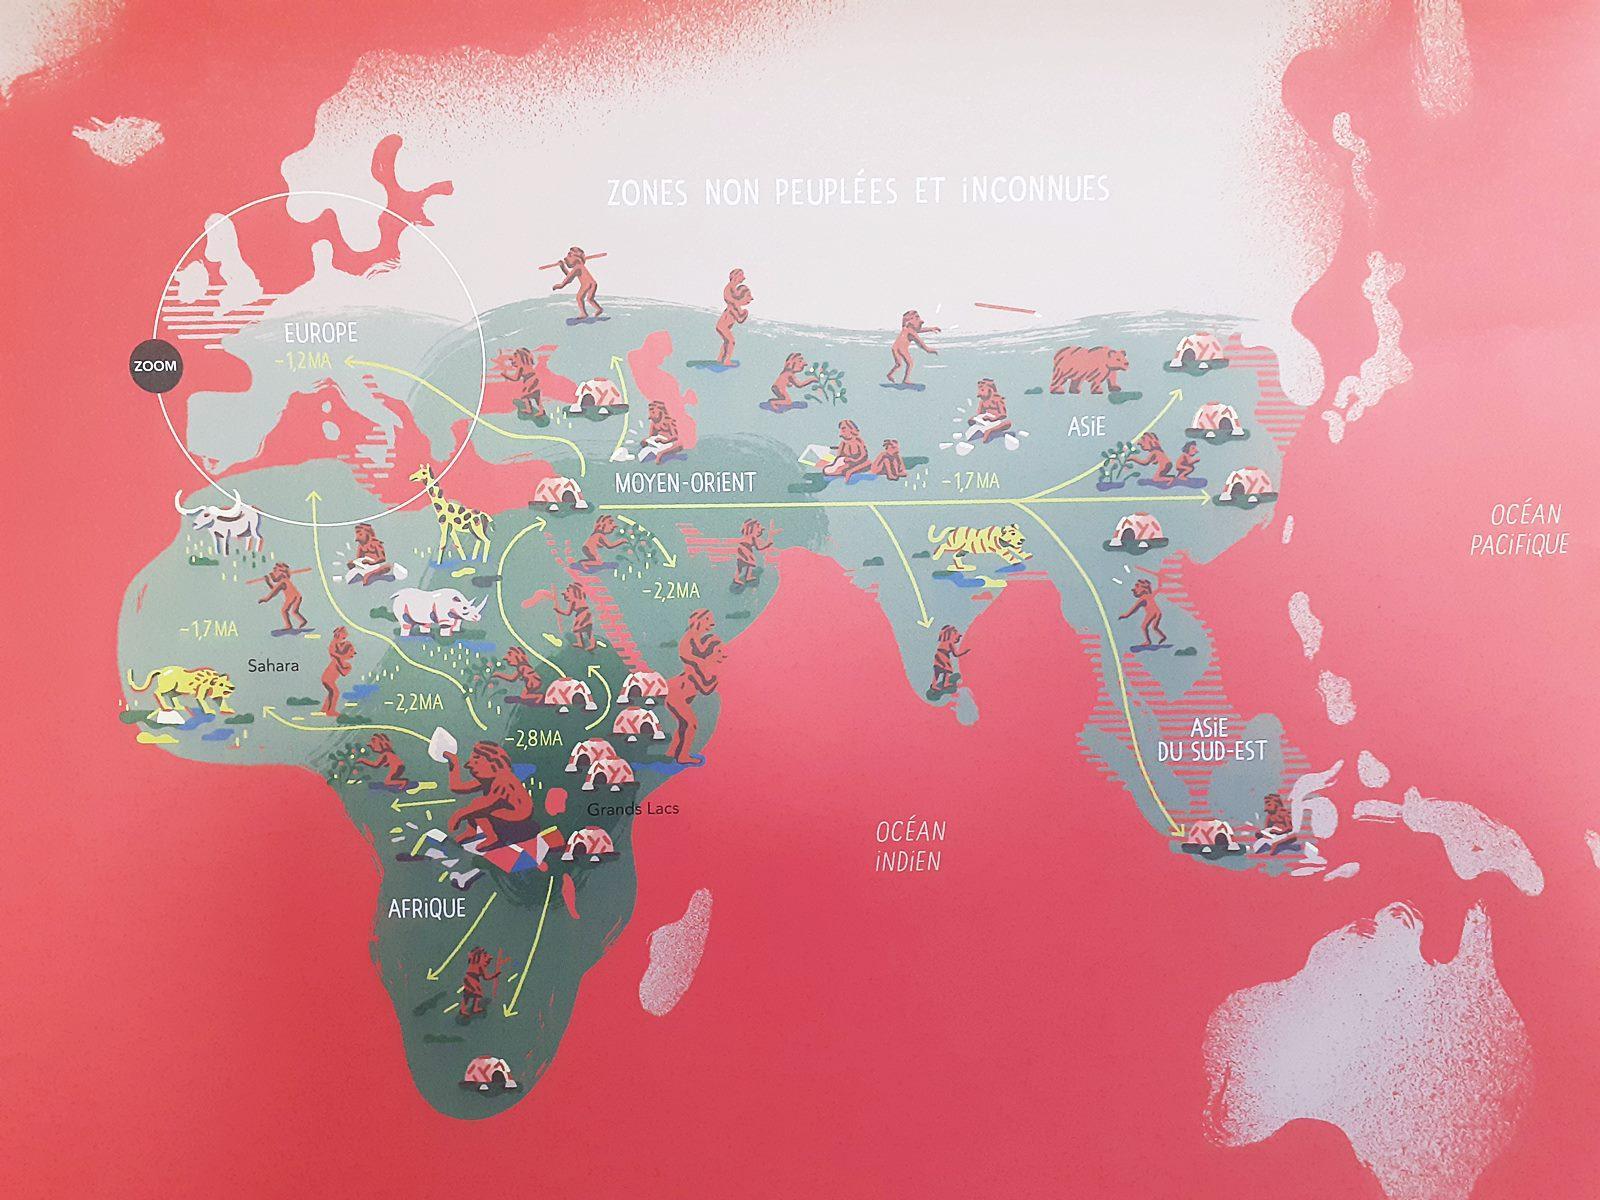 Atlas histoire france20210825 142755